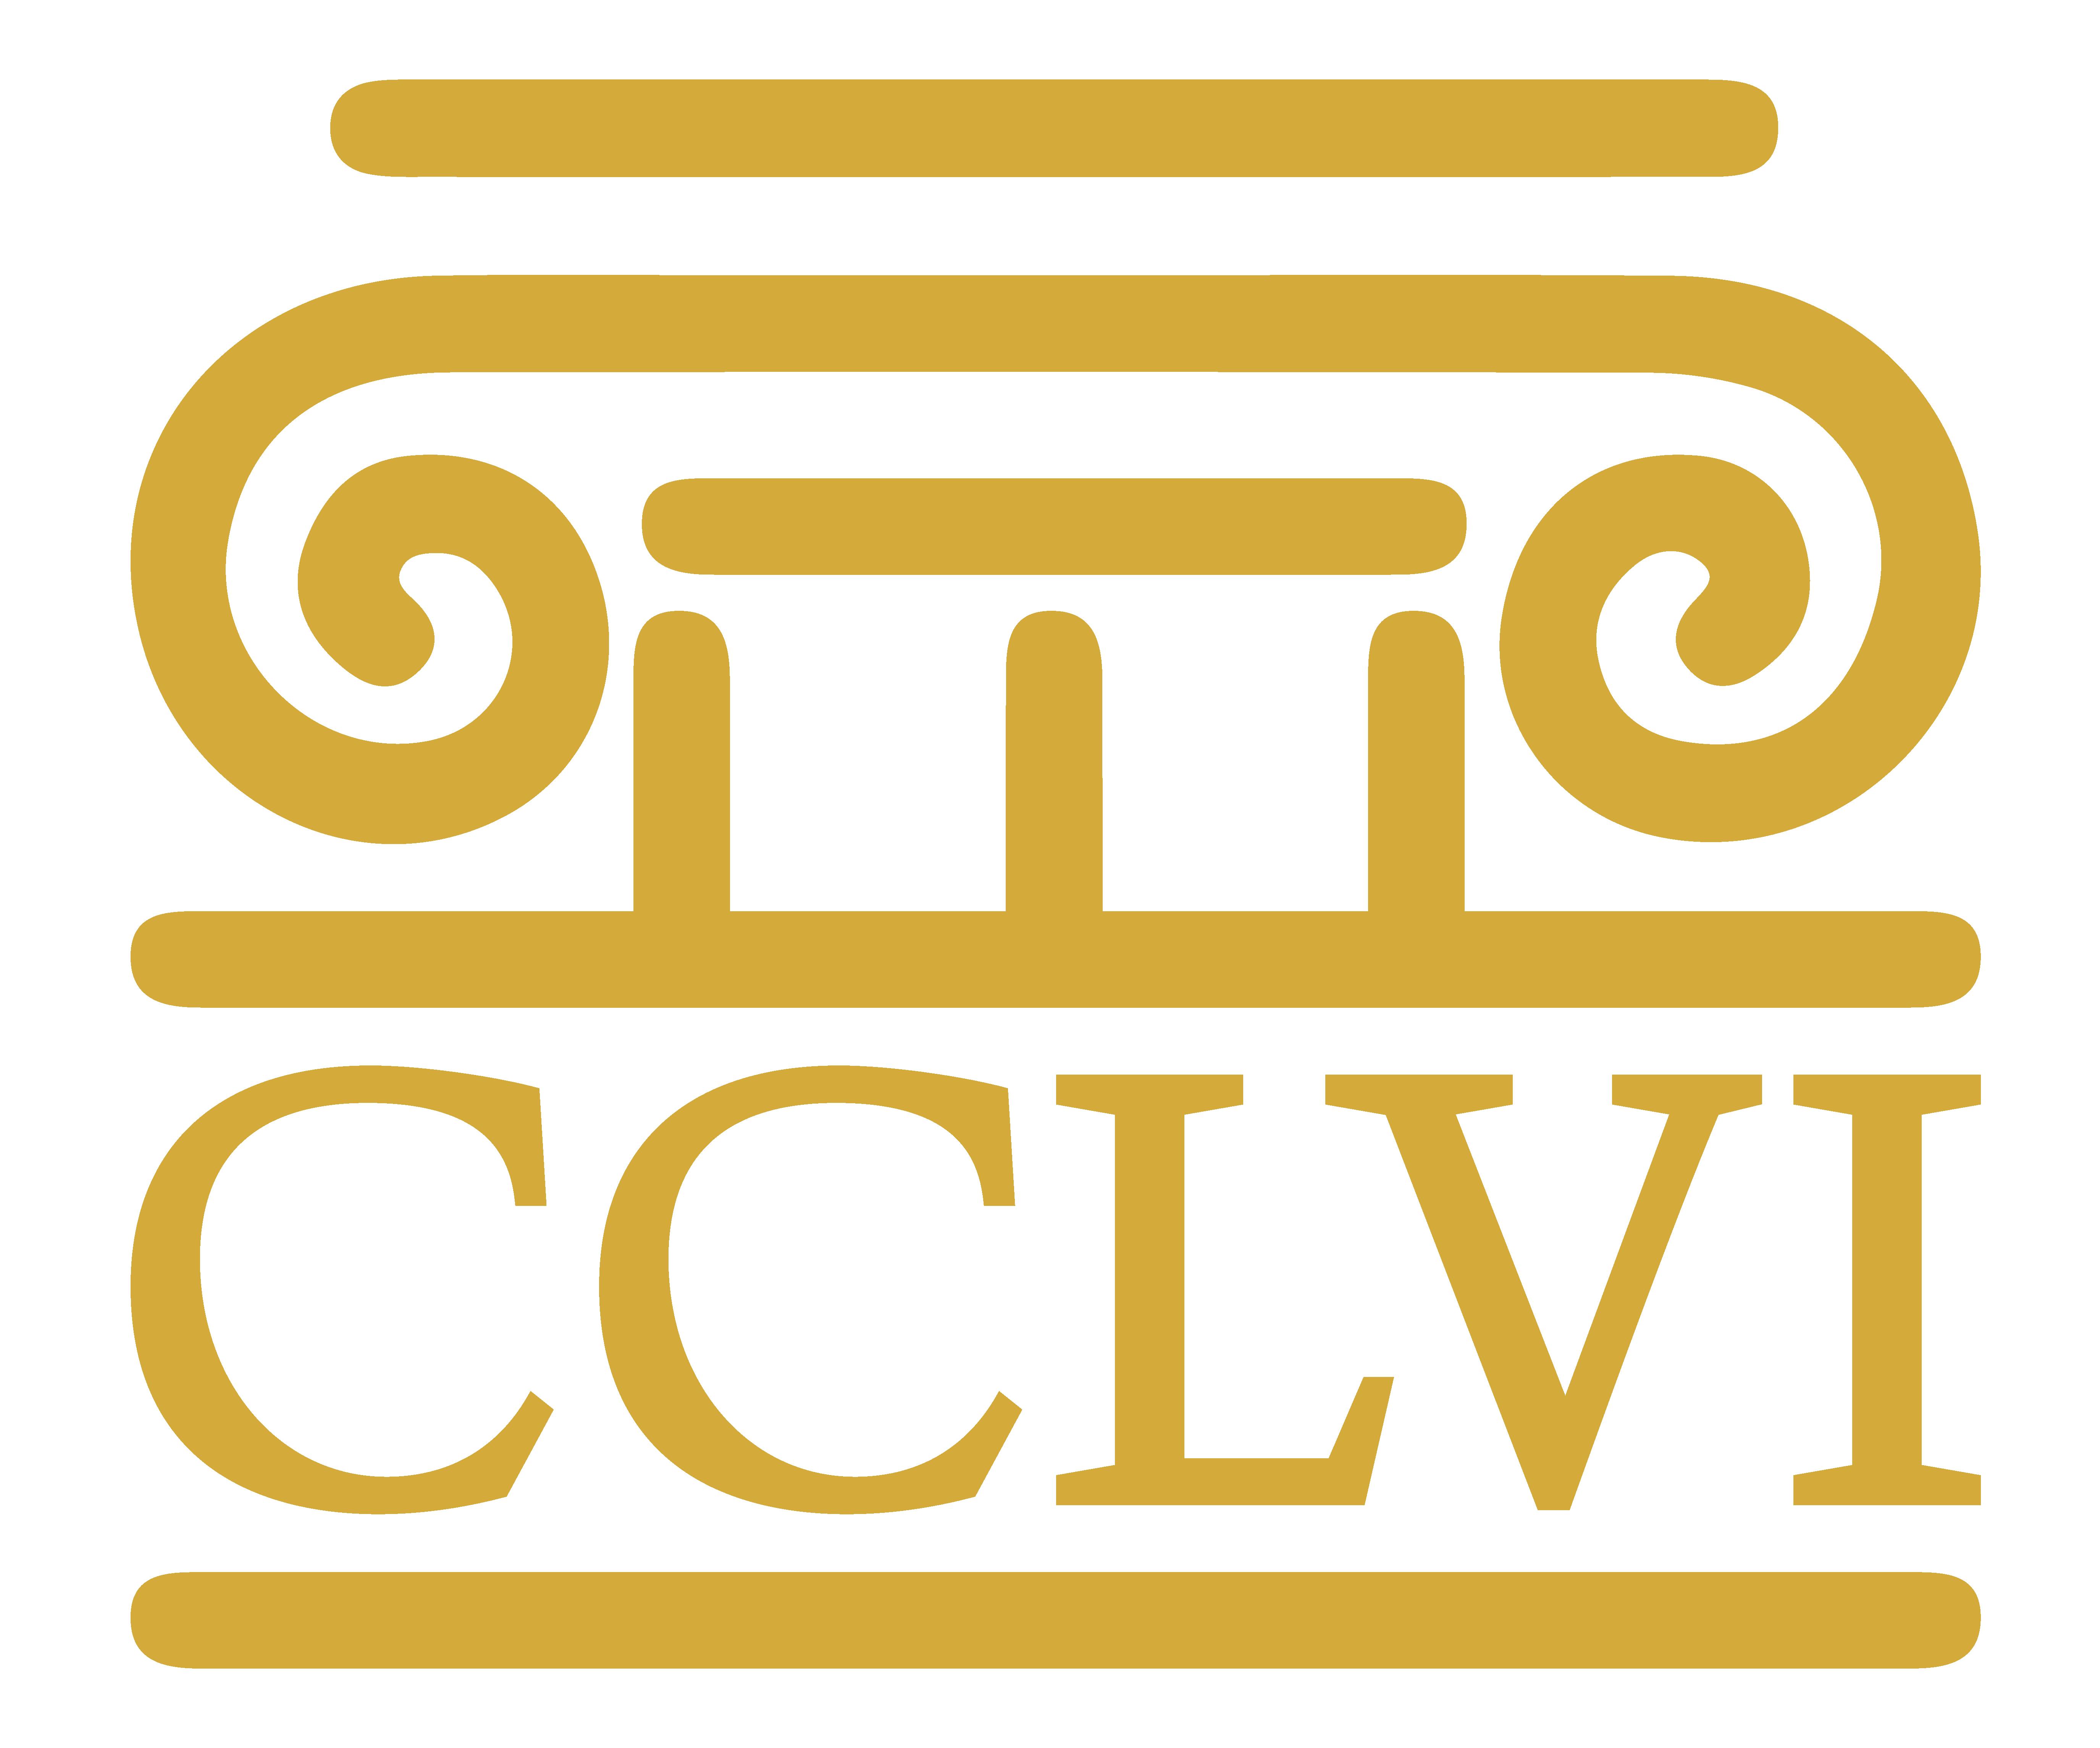 CCLVI